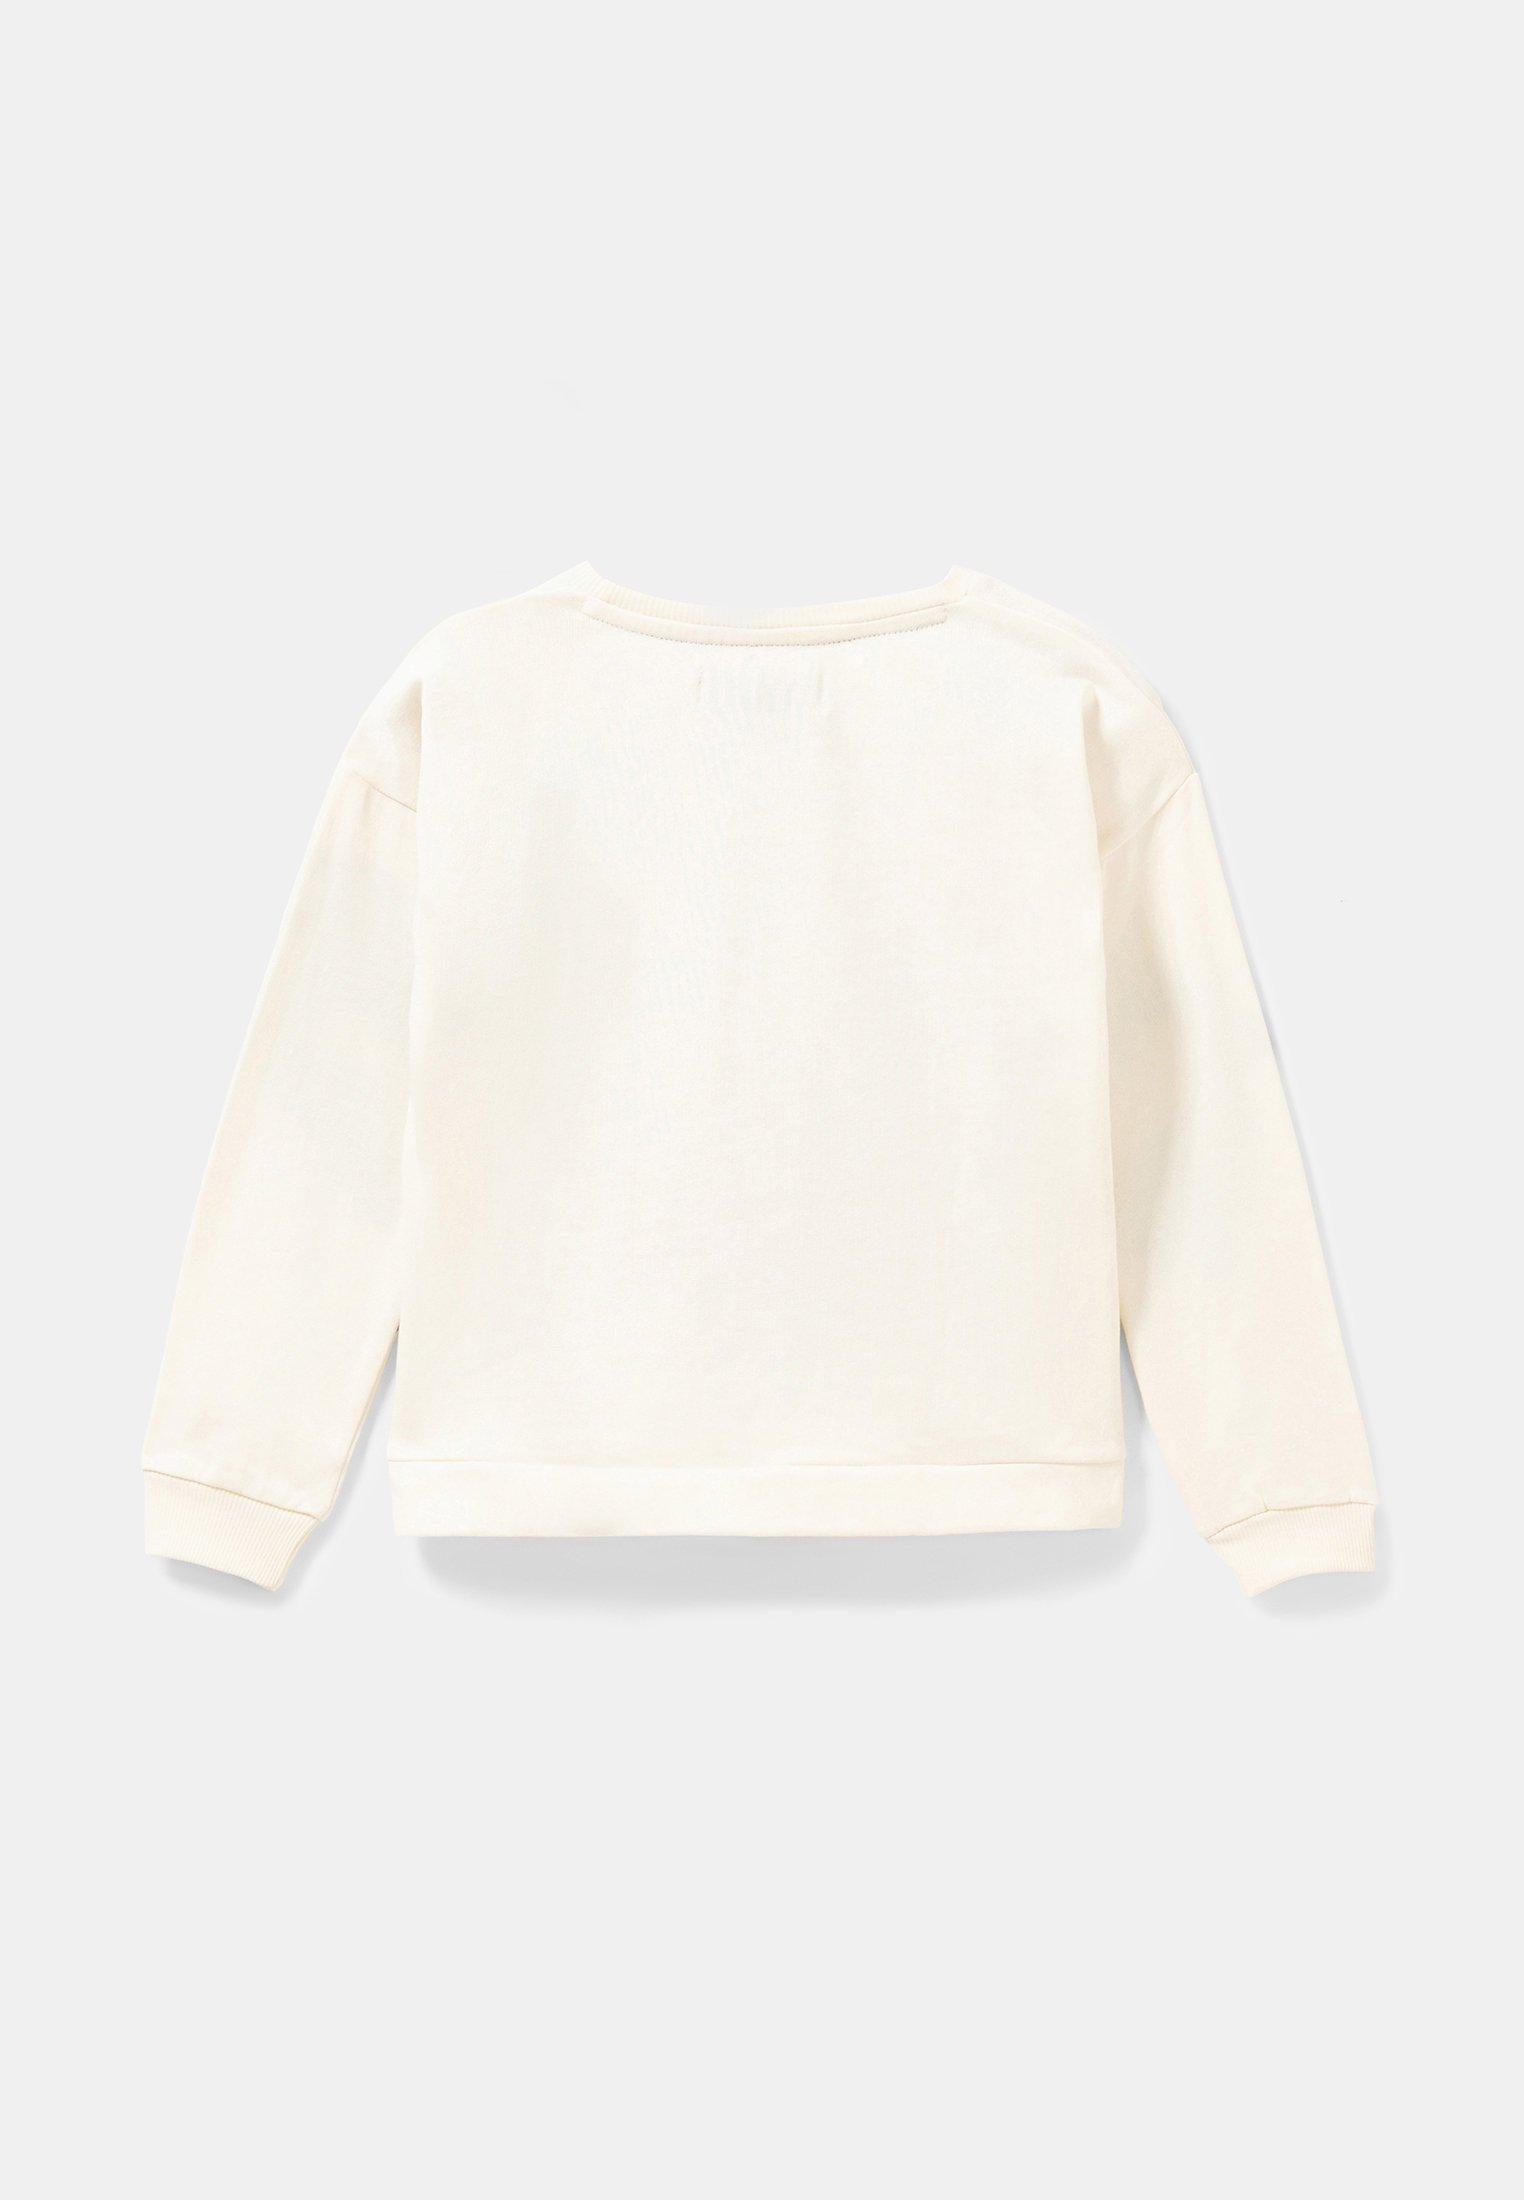 Buy Wholesale Desigual Jumper - white | kids's clothing 2020 lXTPT